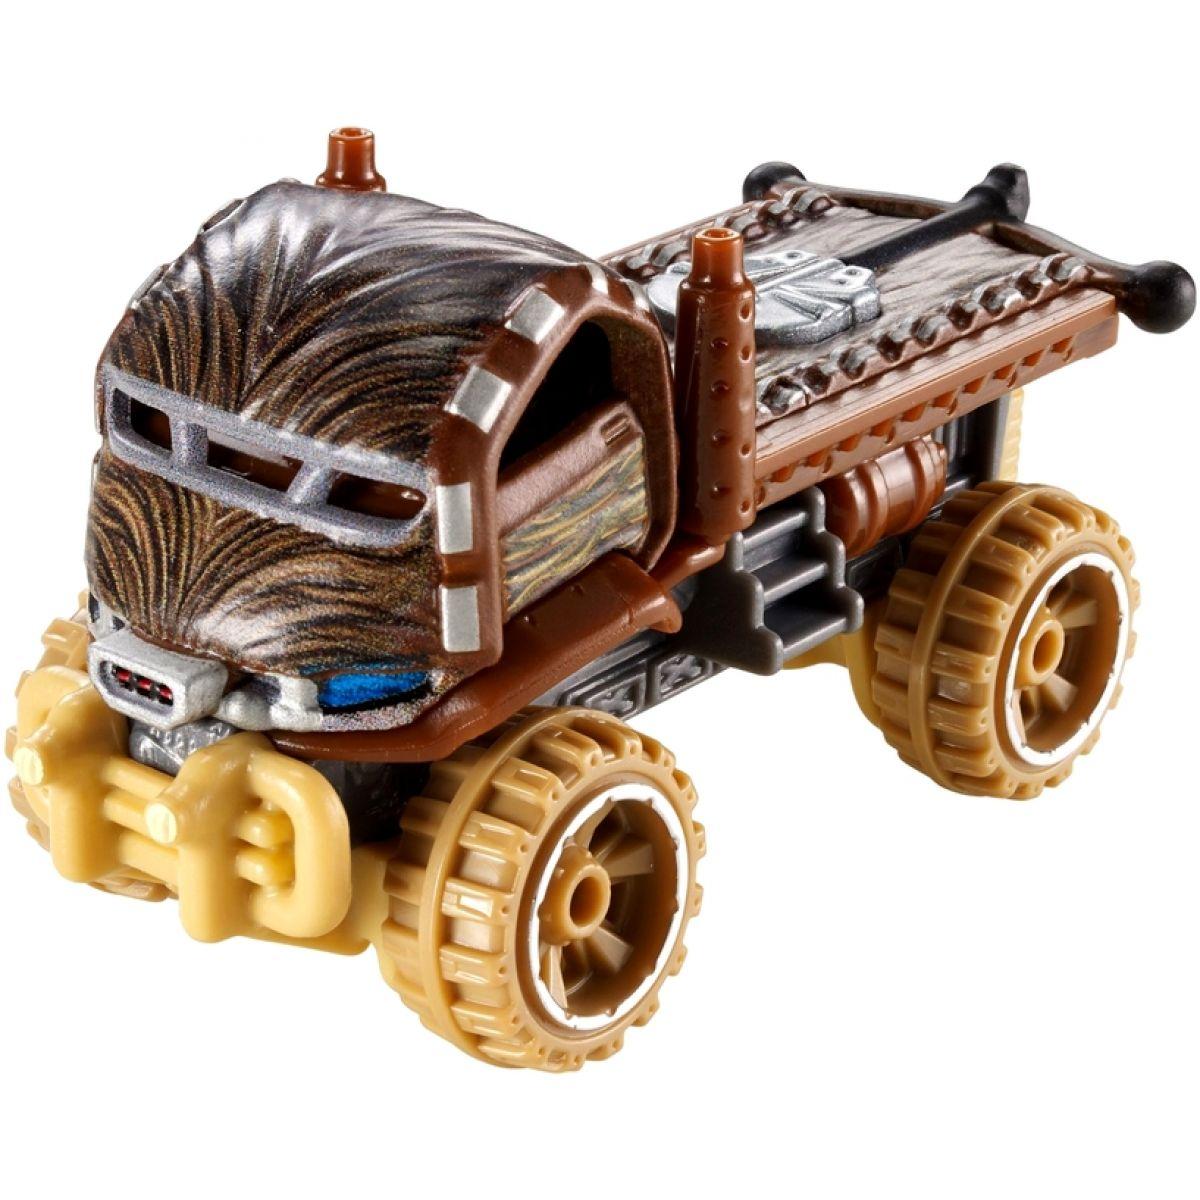 Hot Wheels Star Wars Character cars angličák - Chewbacca DXP43